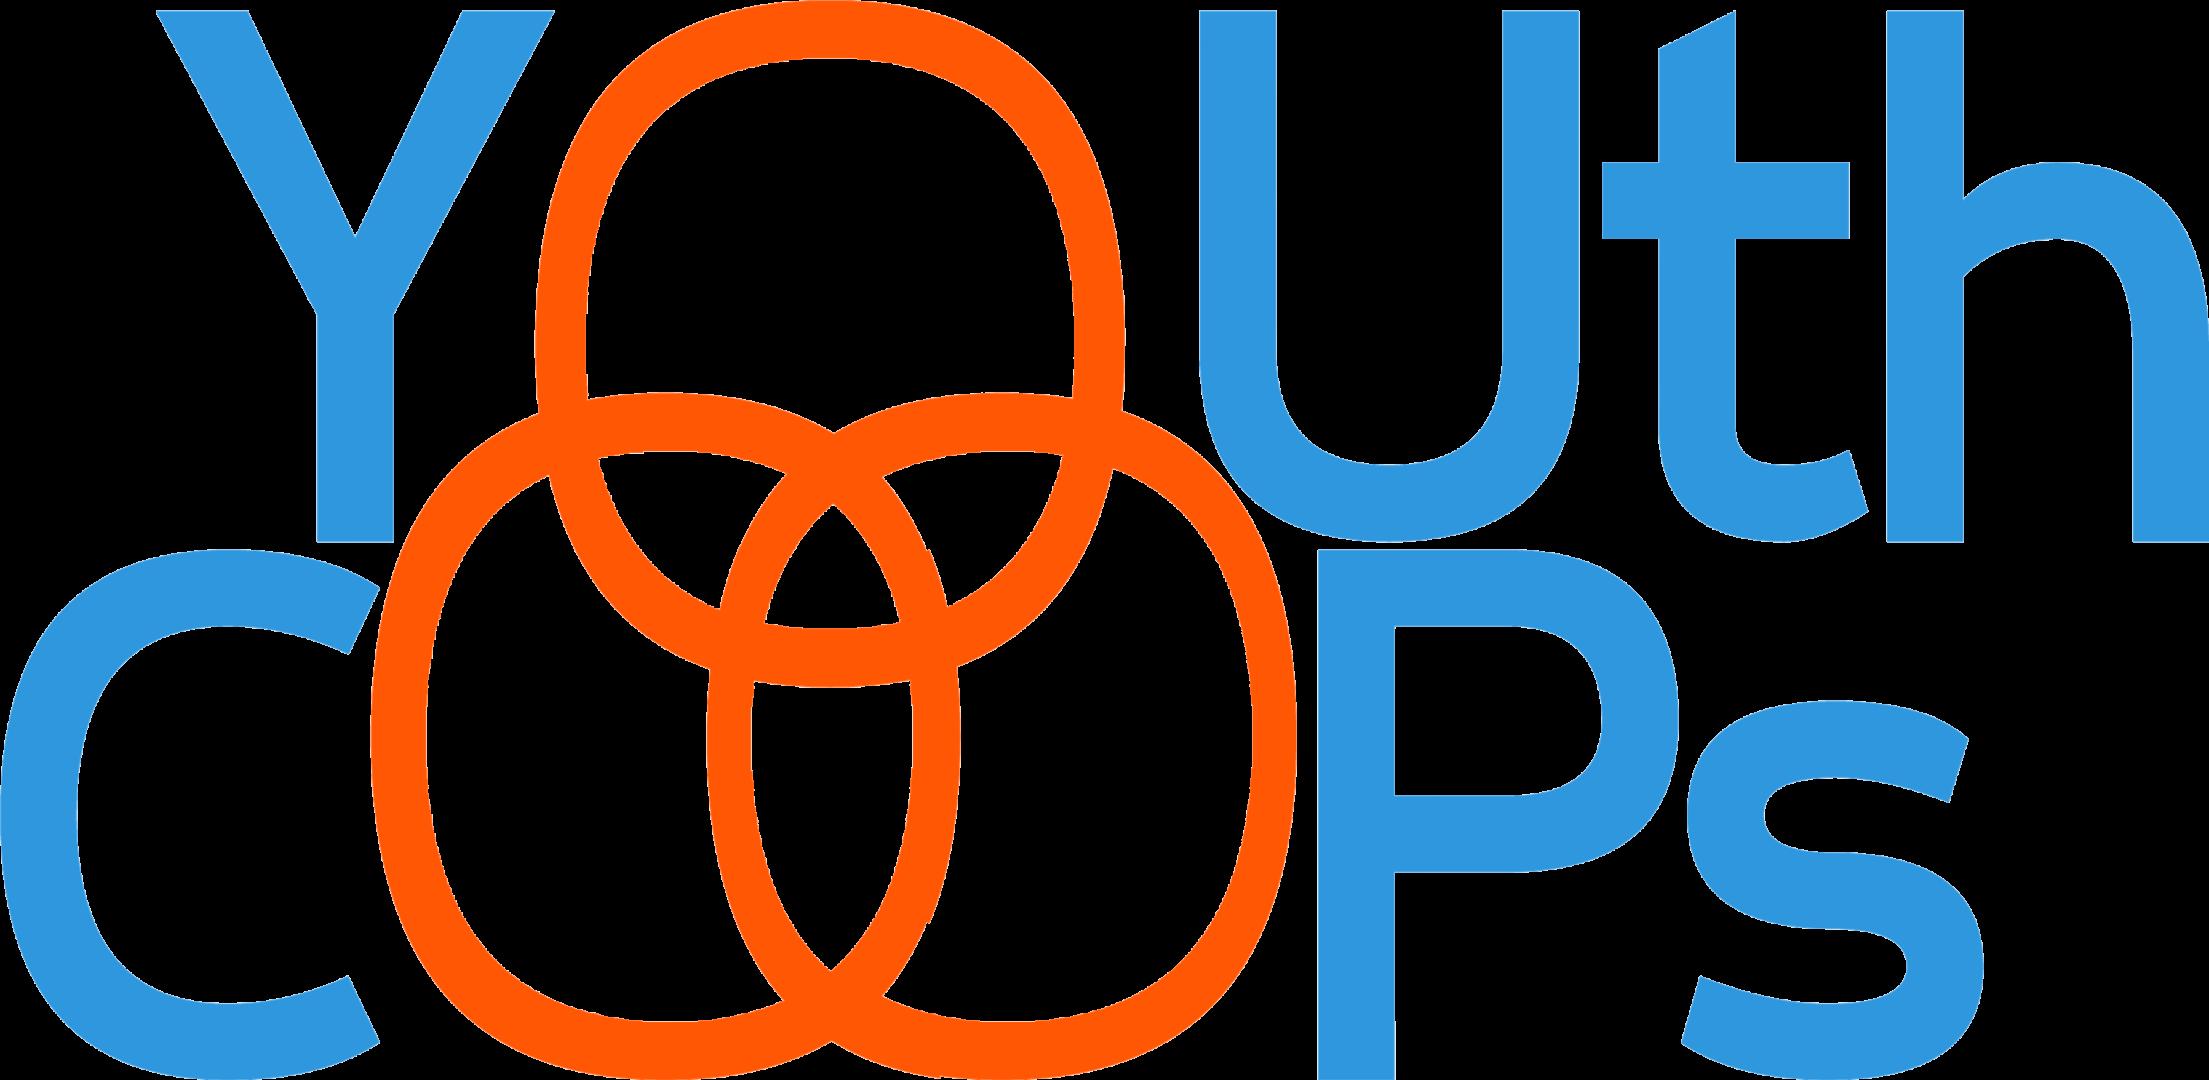 YOUthCOOPs EU Project Logo